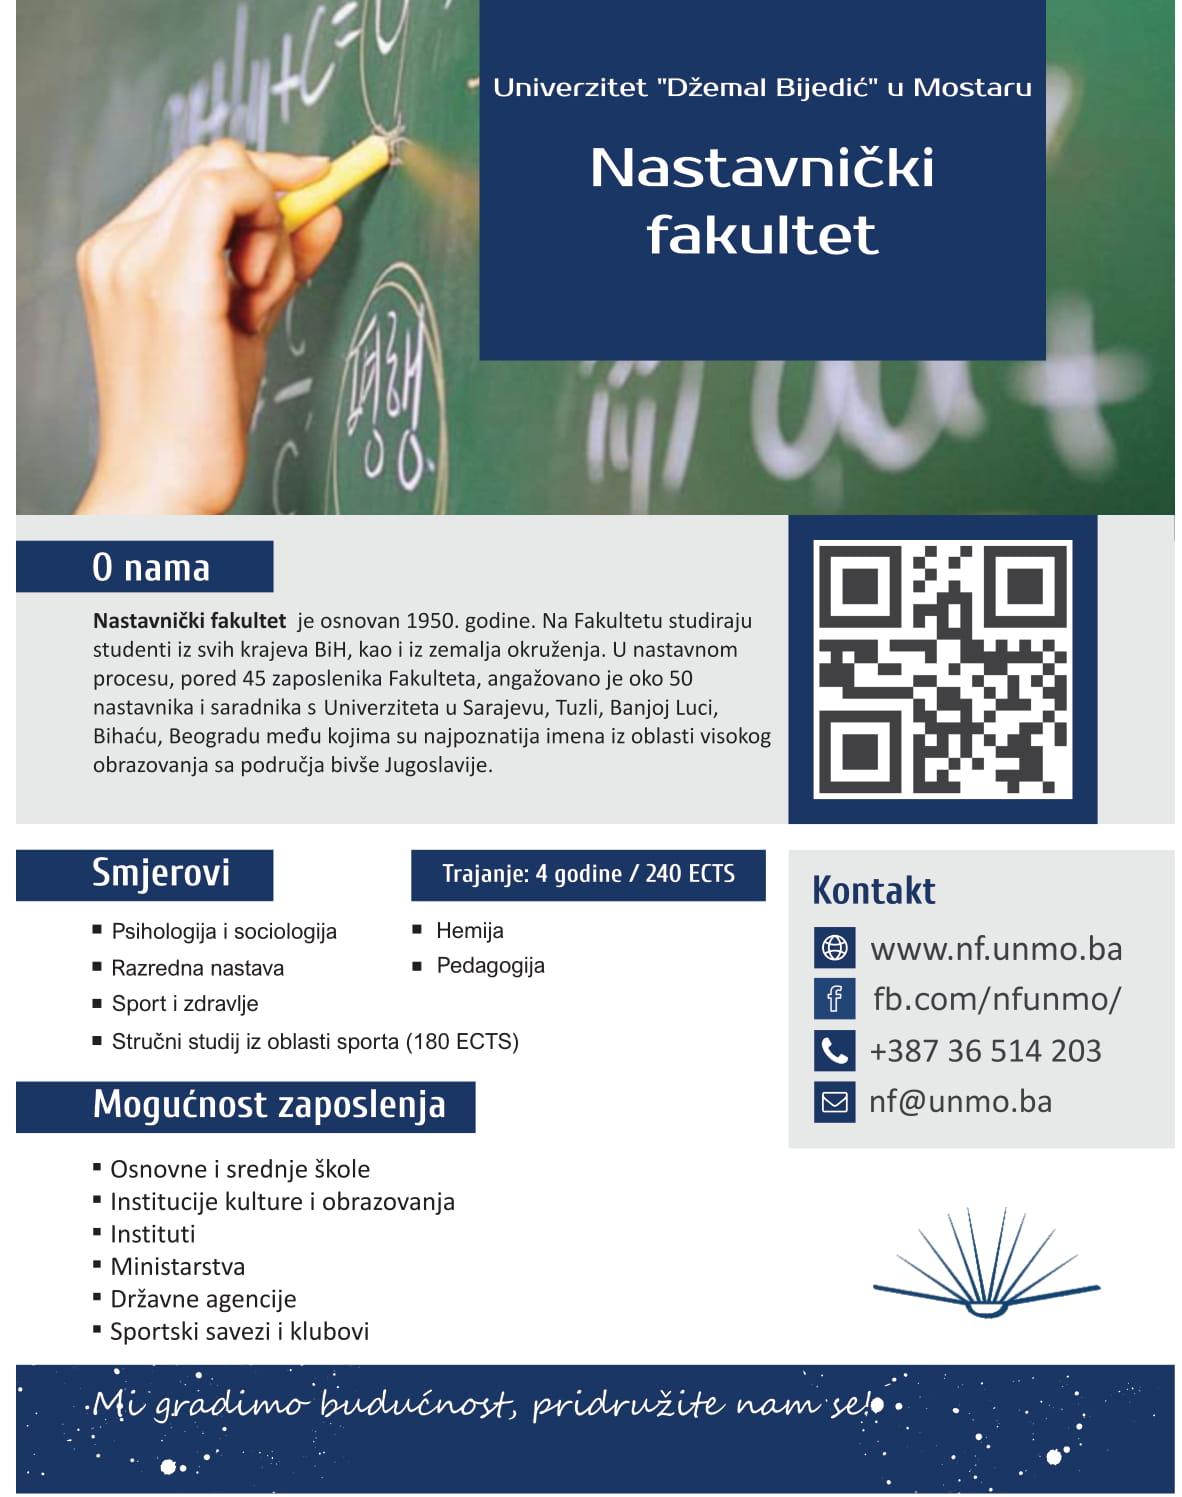 W3Schools